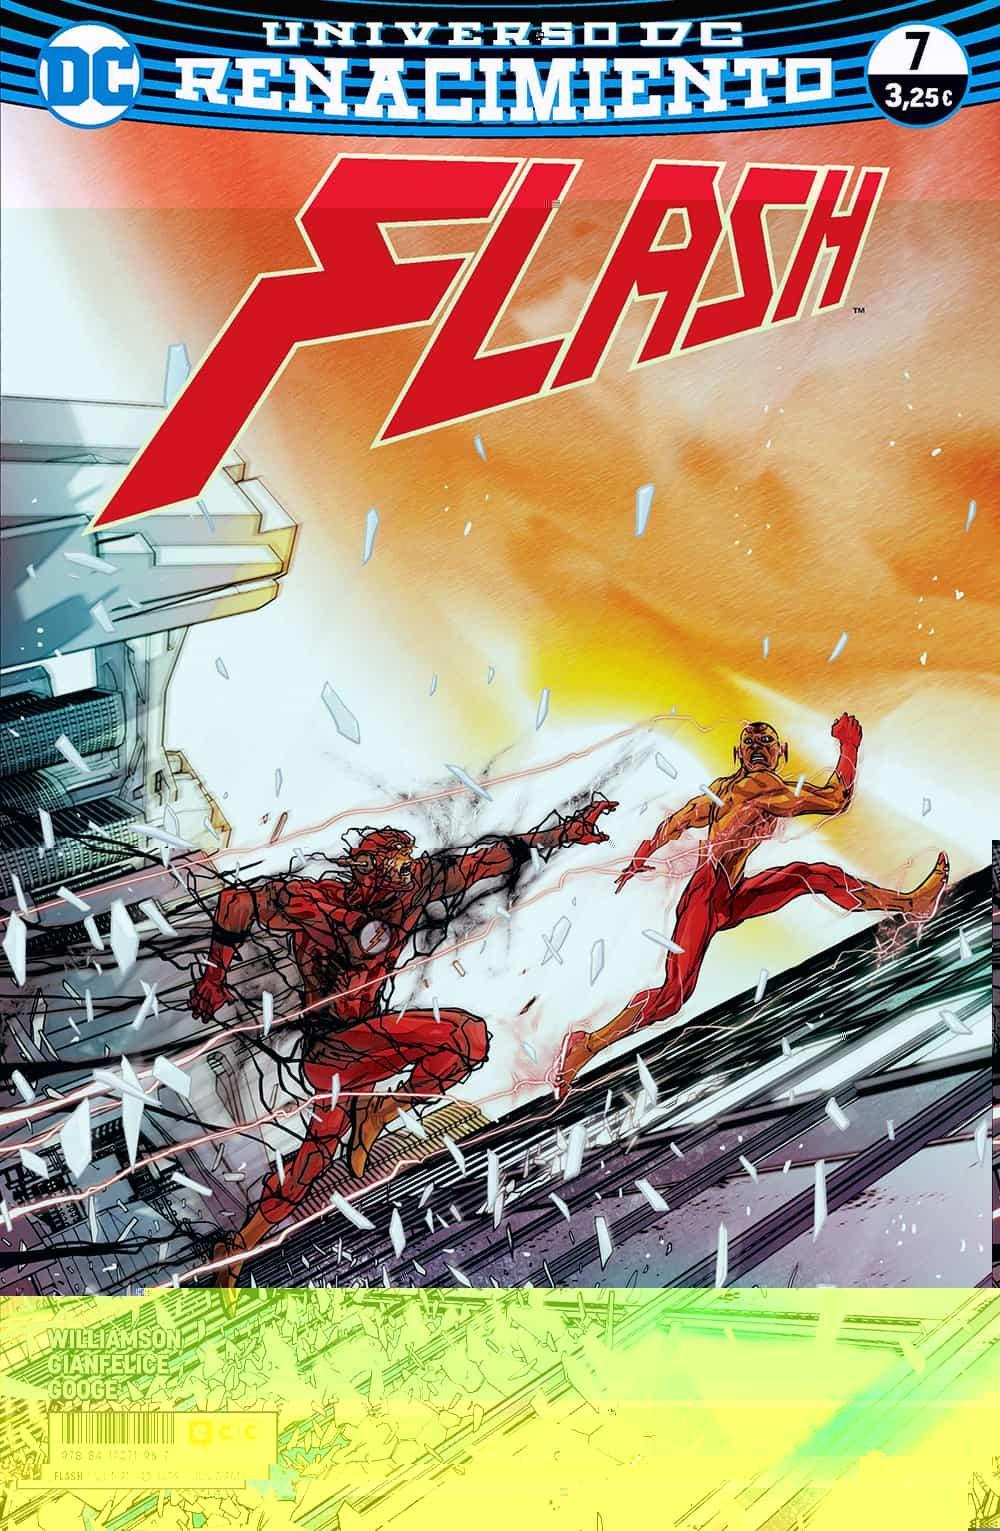 Flash Núm. 21/ 7 (renacimiento) - Williamson Joshua